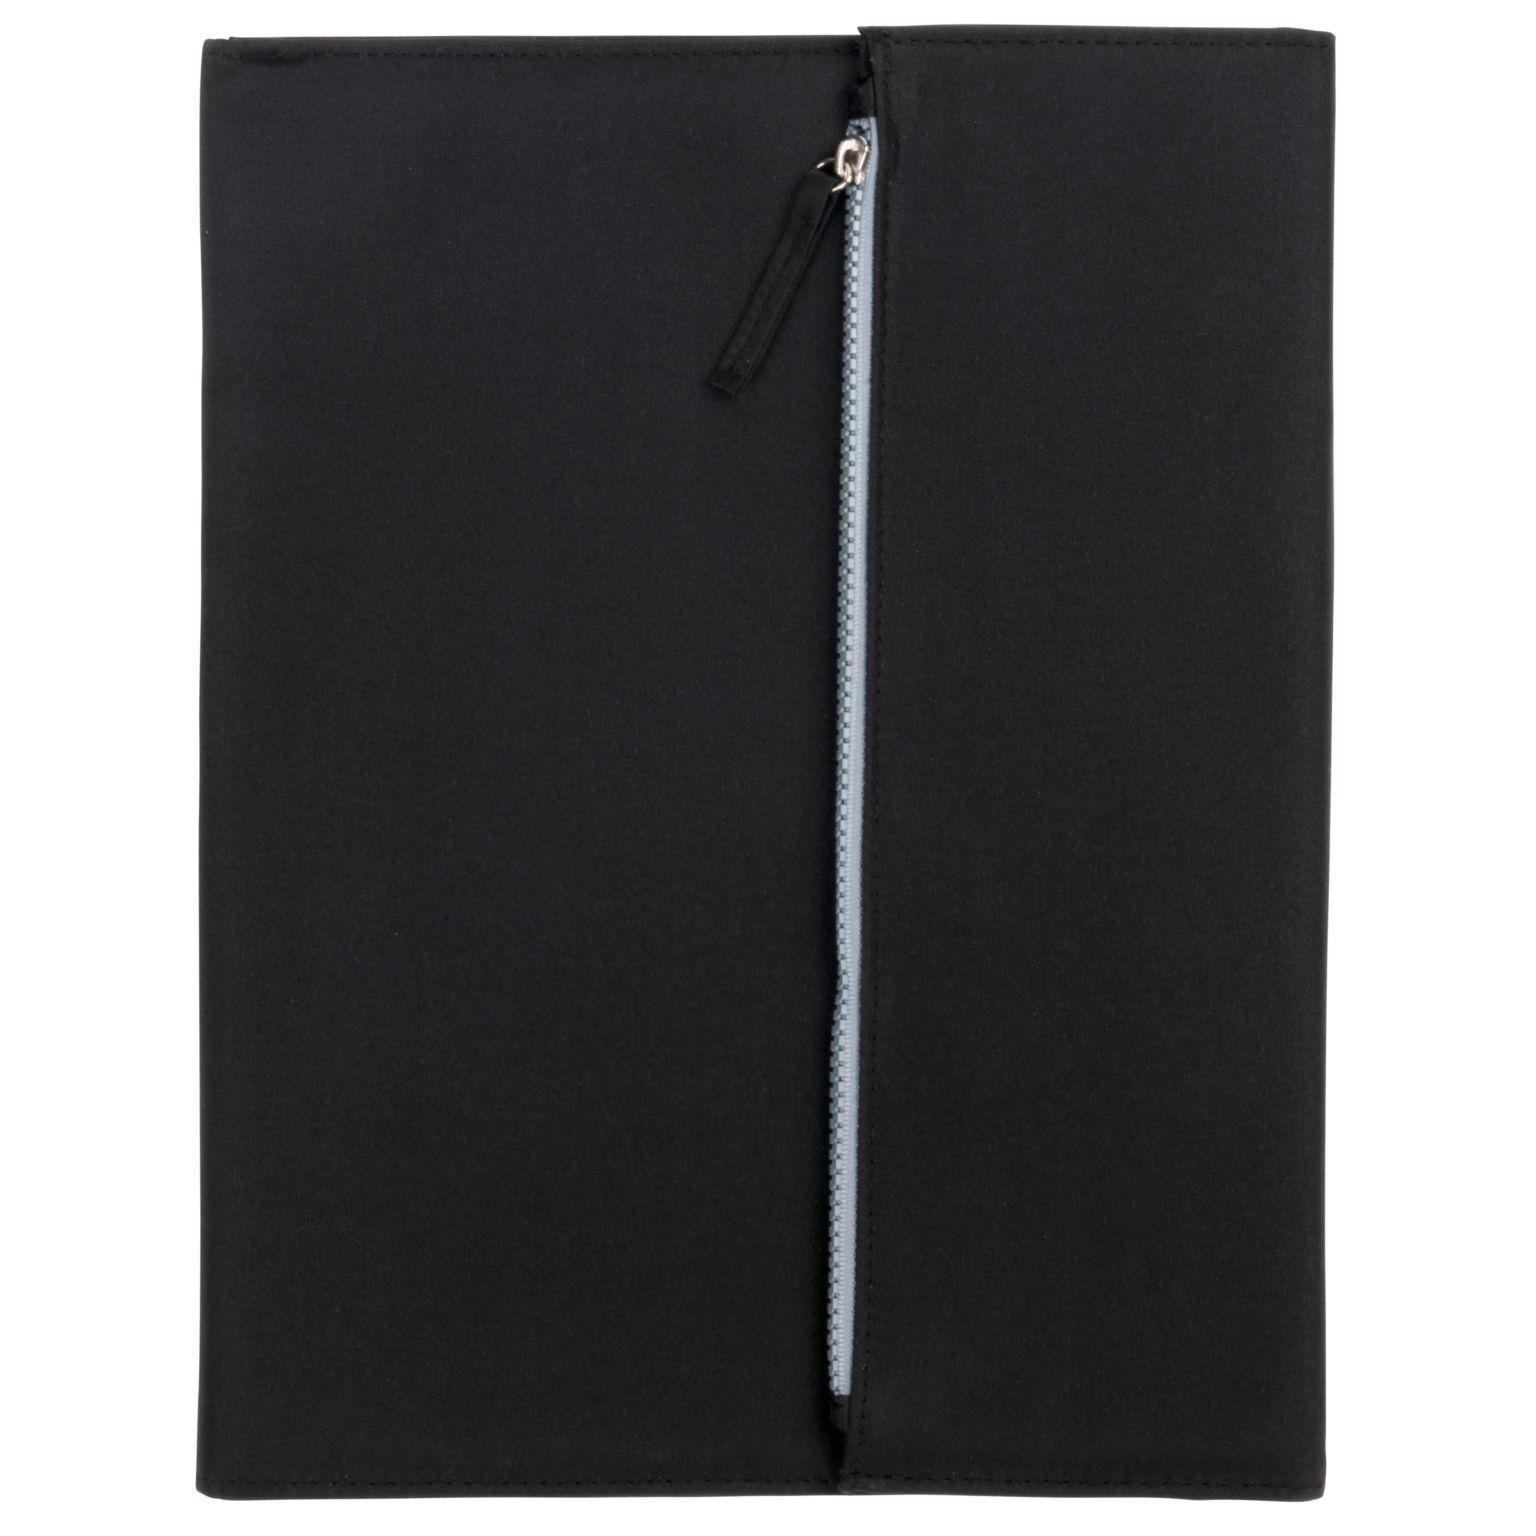 Porte-document ZIPPER format DIN-A4